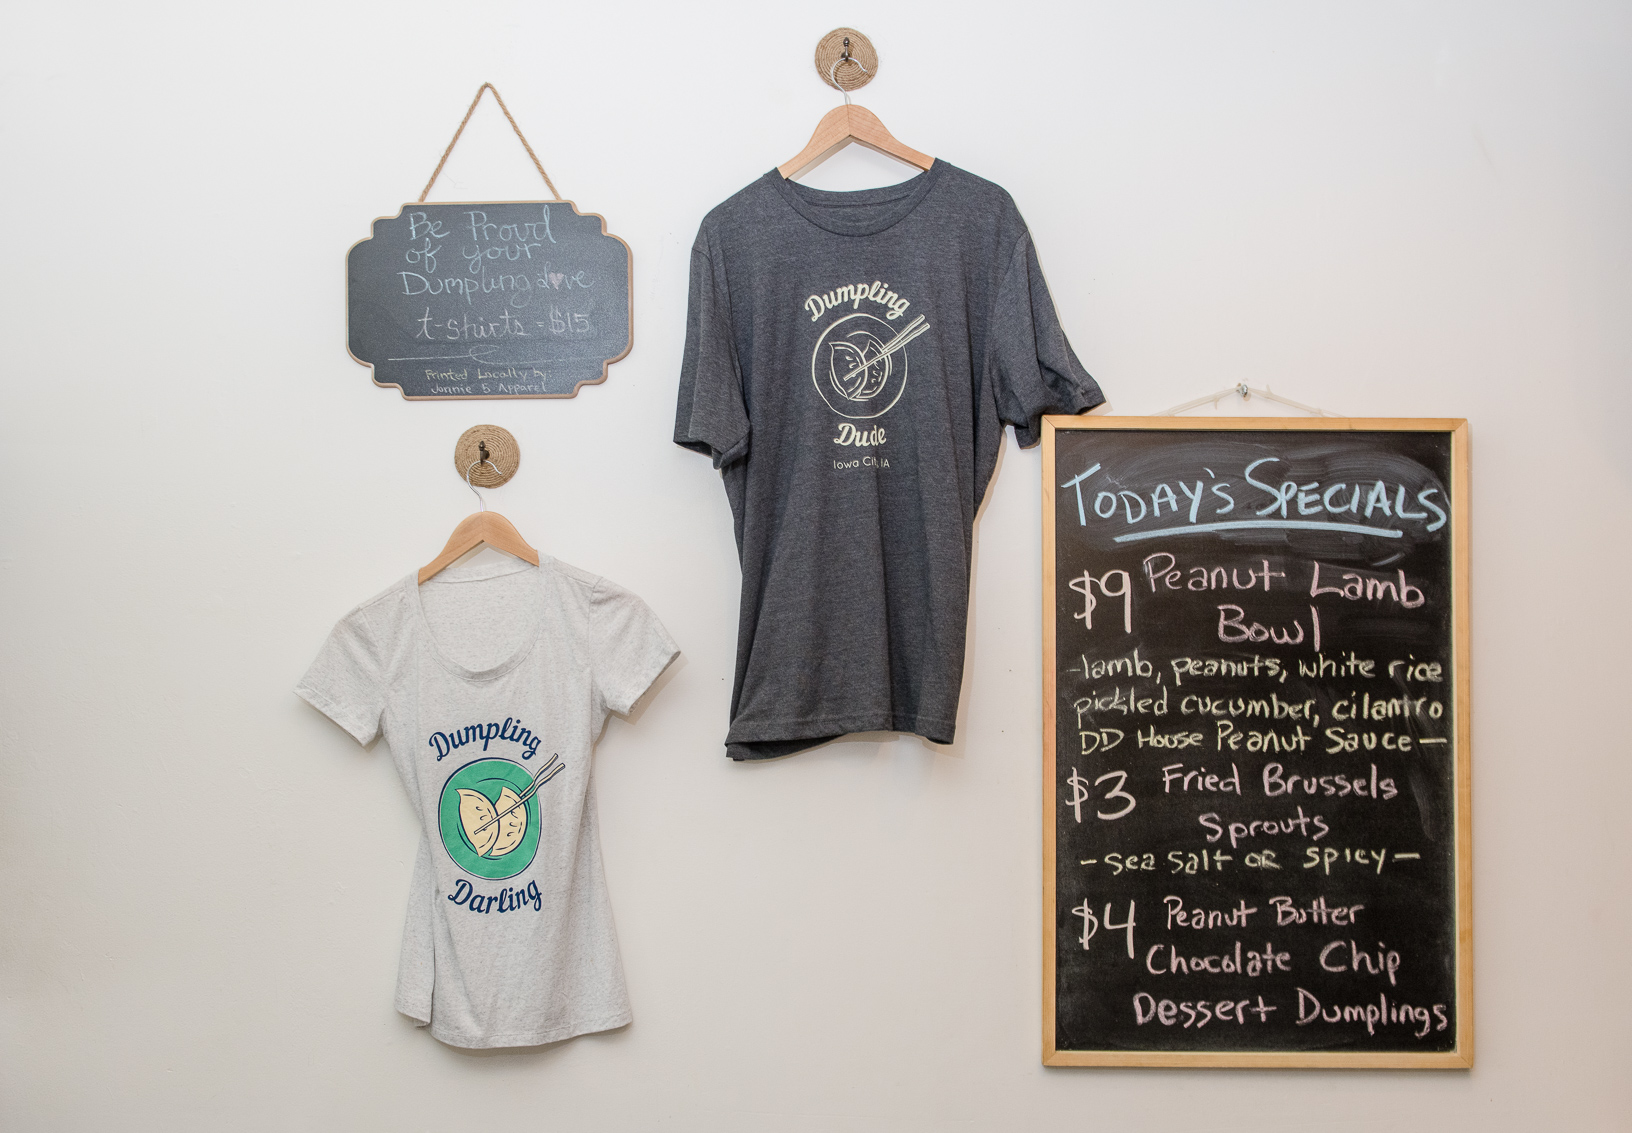 Apparel and menu specials hang on the wall at Dumpling Darling's Iowa City location.